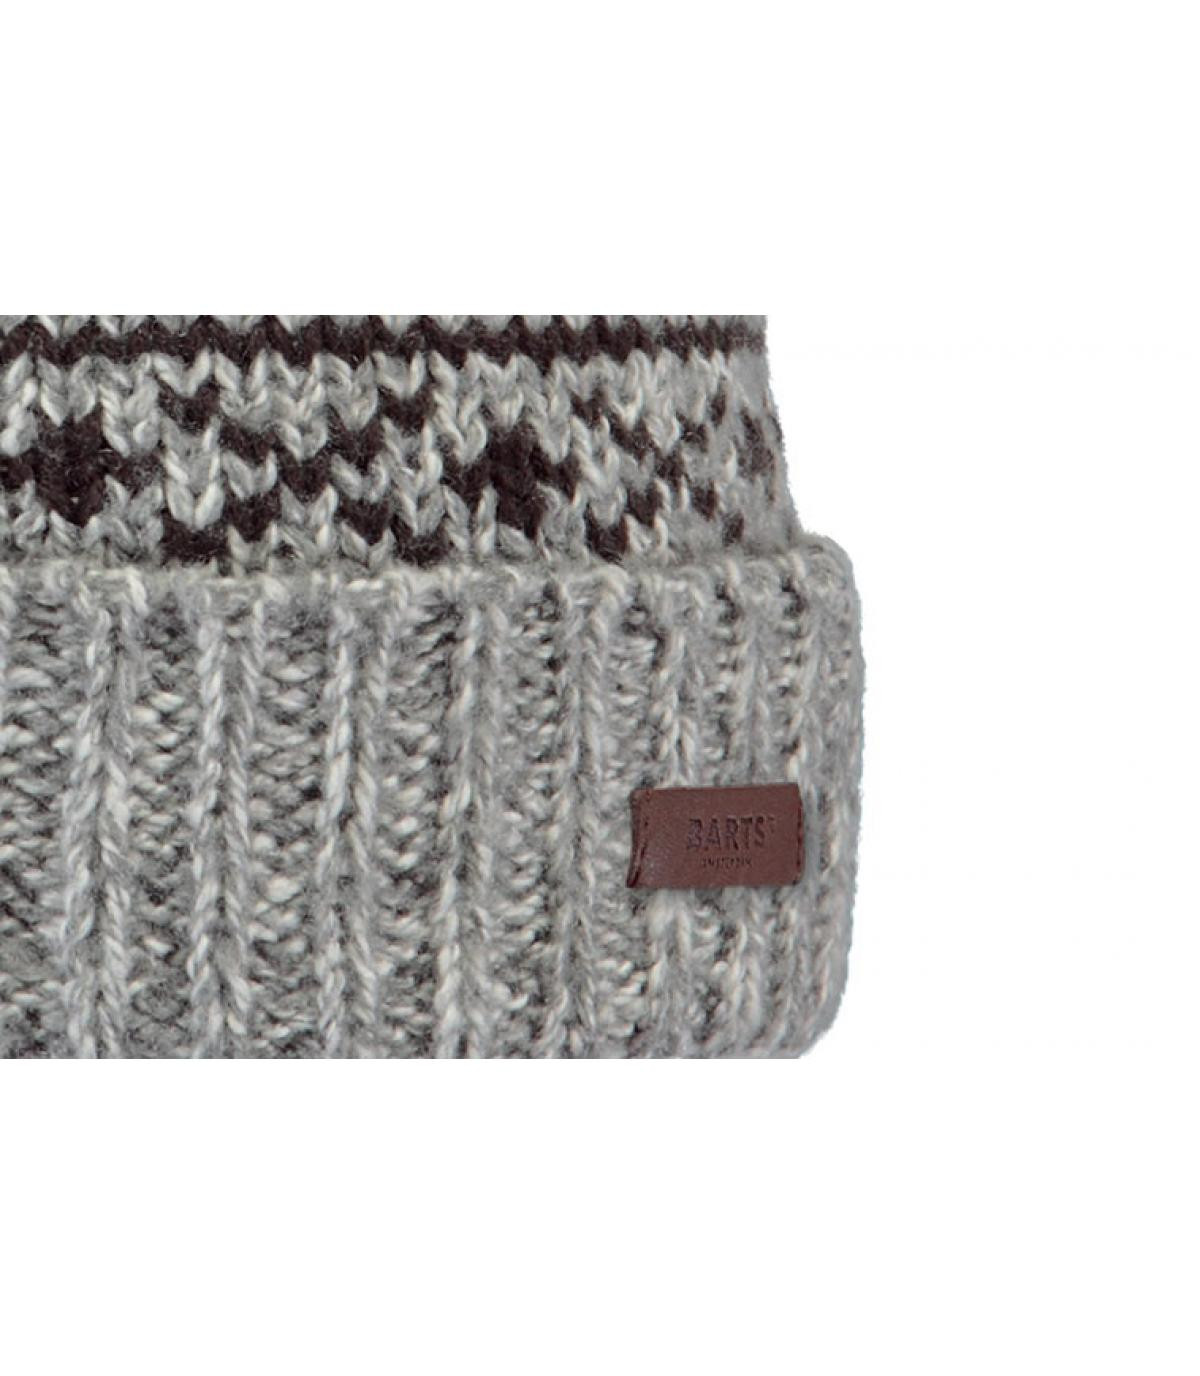 Details Cartonn Beanie heather grey - Abbildung 3